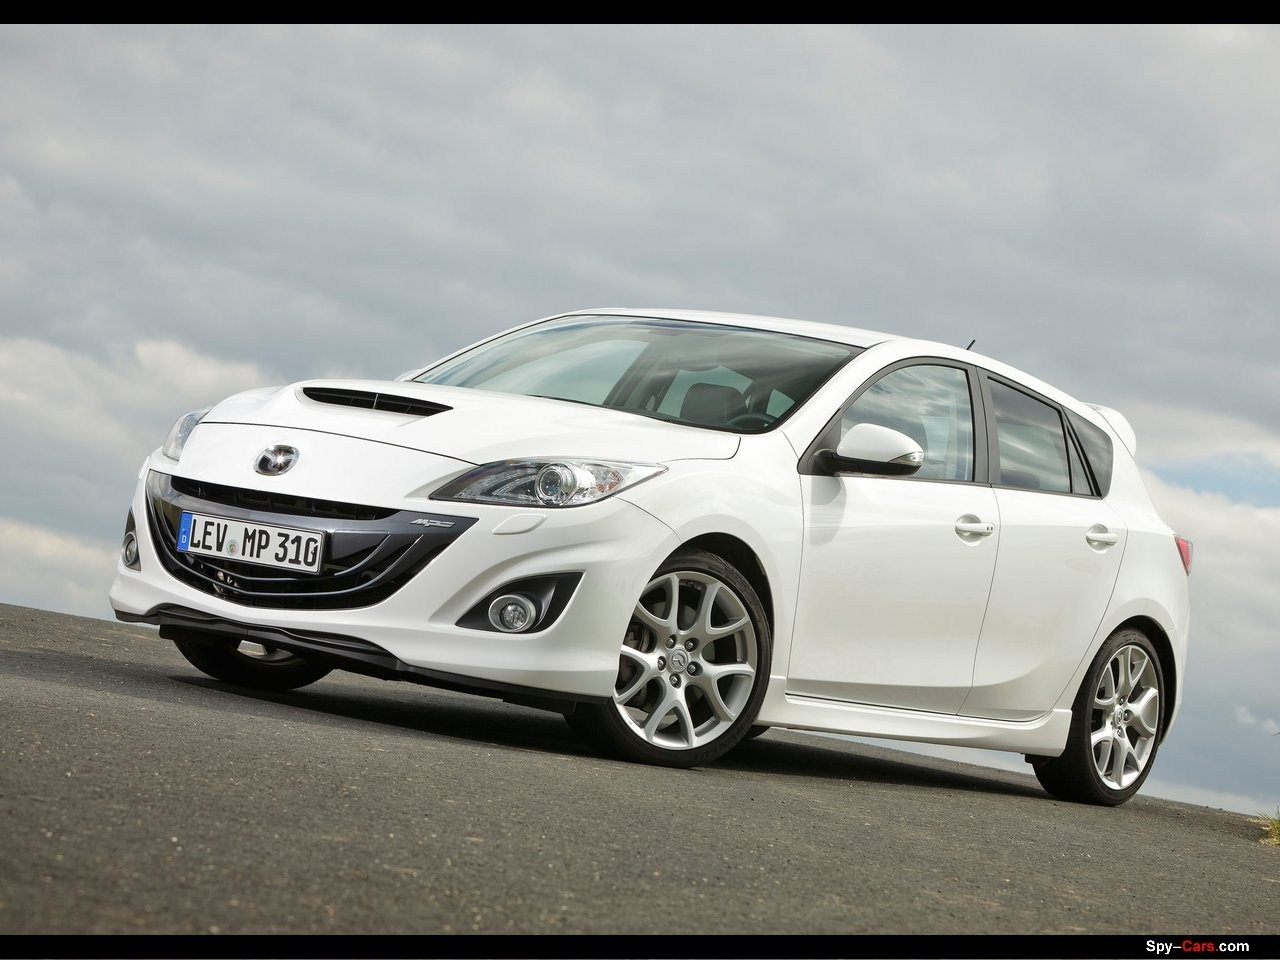 2012 Mazda 3 Mps